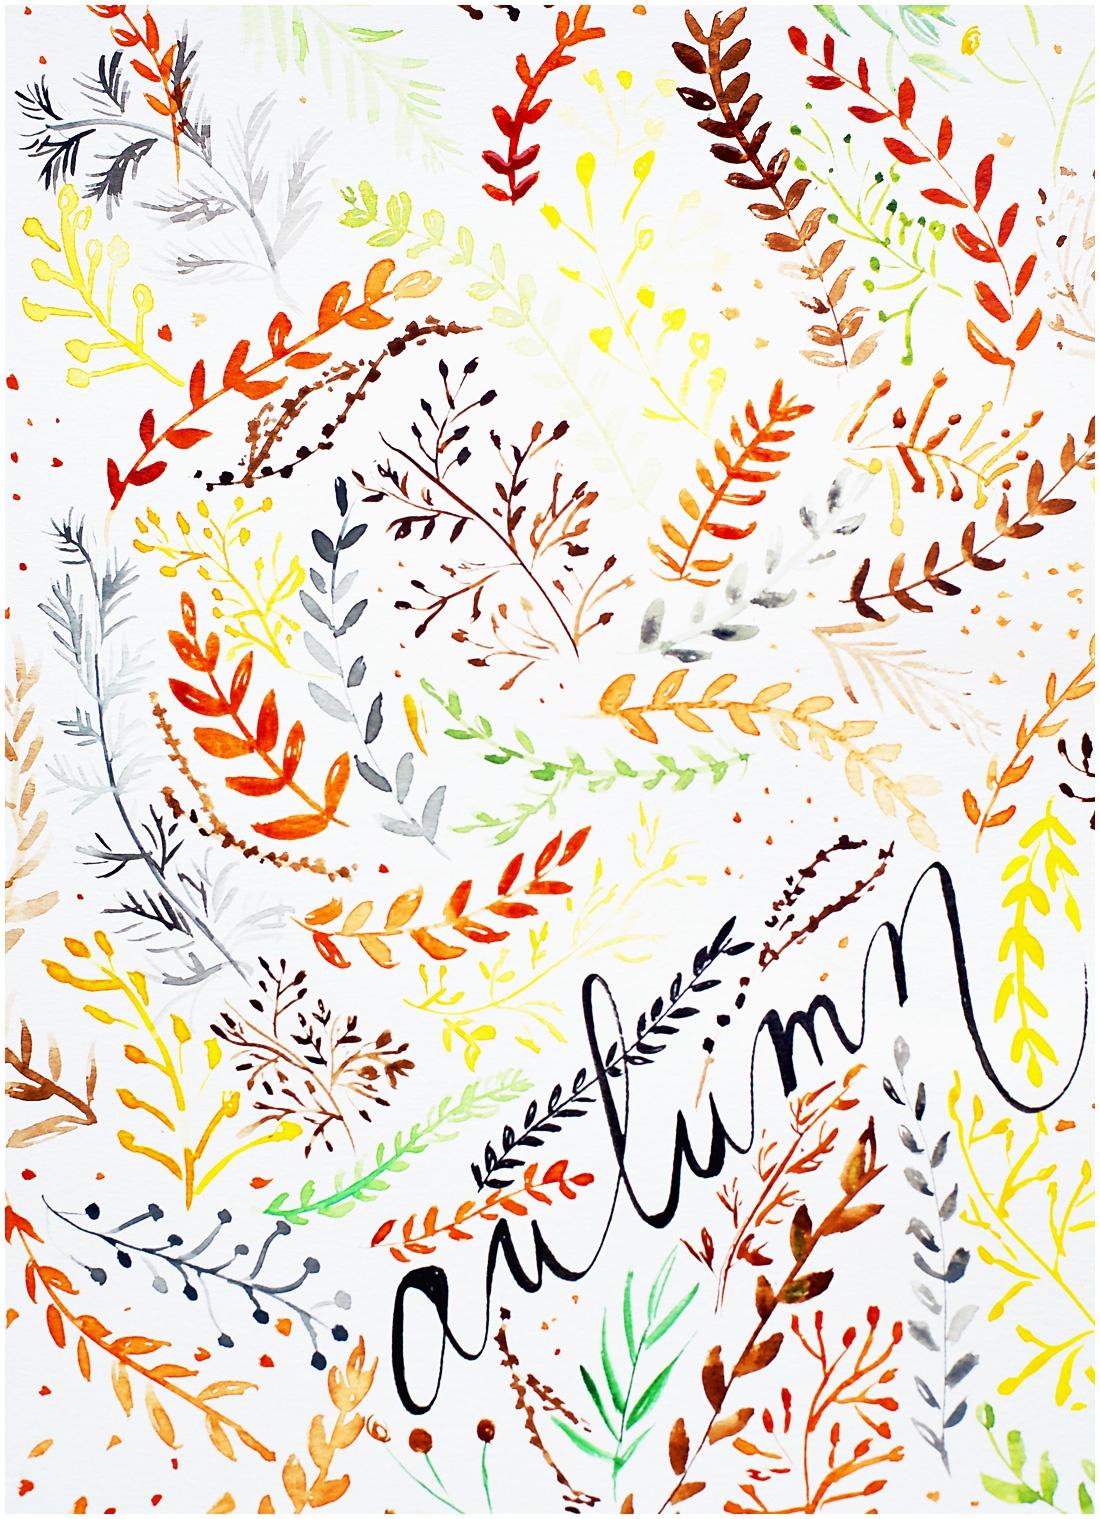 Grab This Pretty Free Autumn Printable! So Lovely♥ - Free Autumn Printables